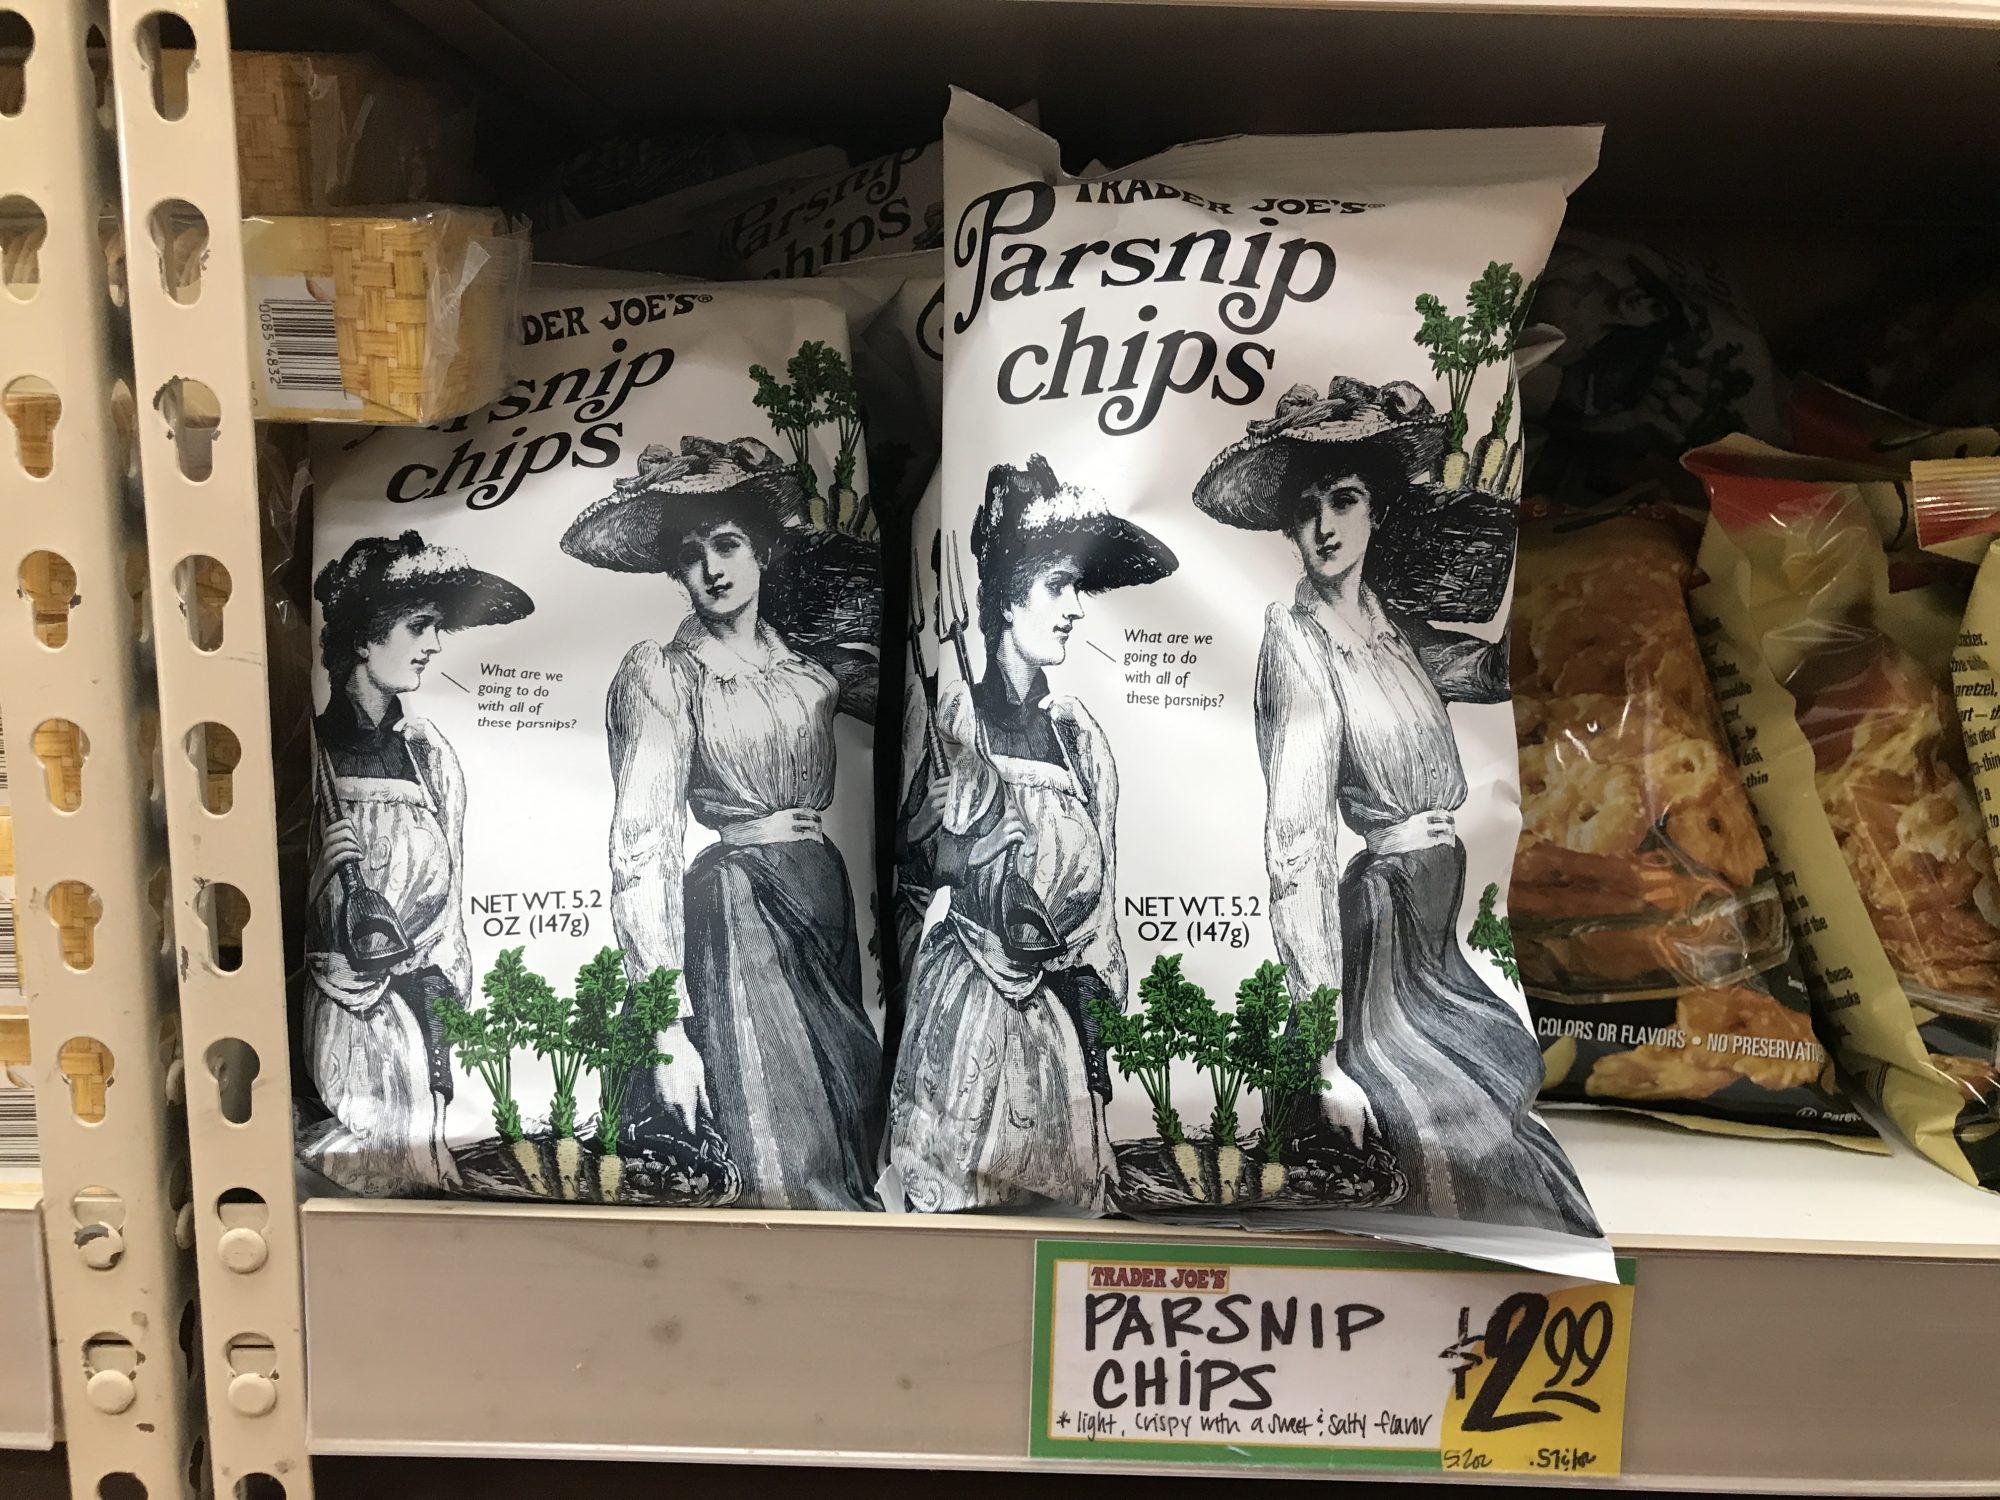 TJ Parsnip Chips